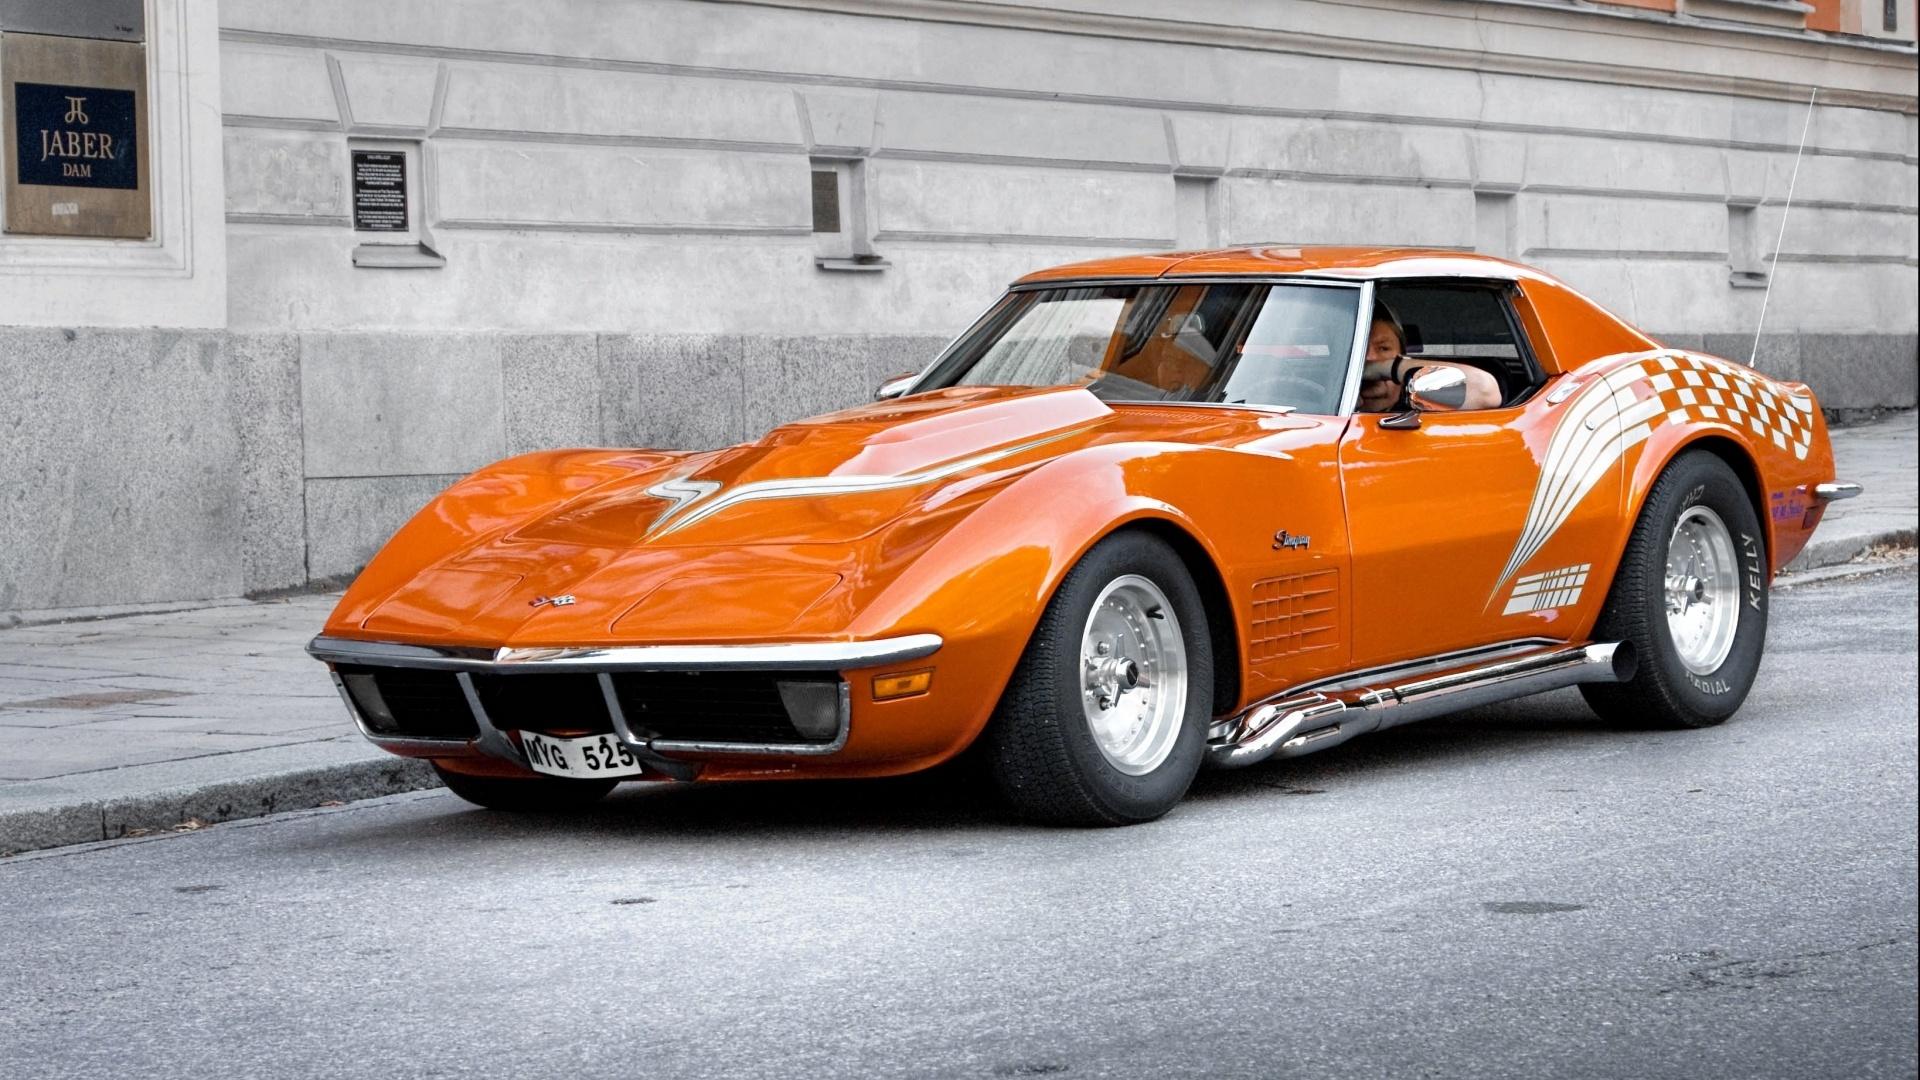 Corvette free background